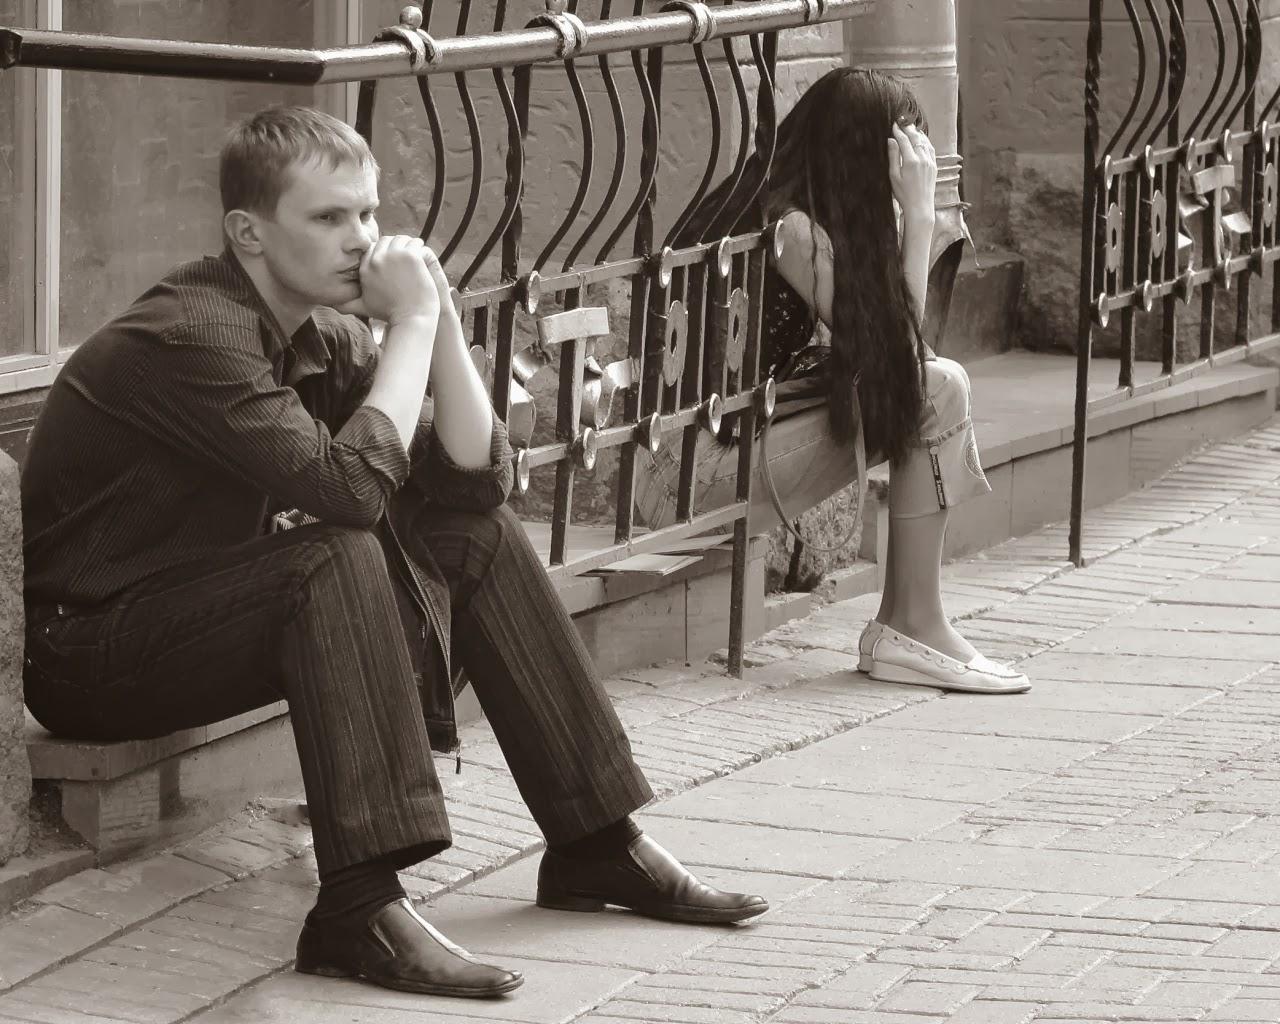 Sad break up story | Love Romance and Health